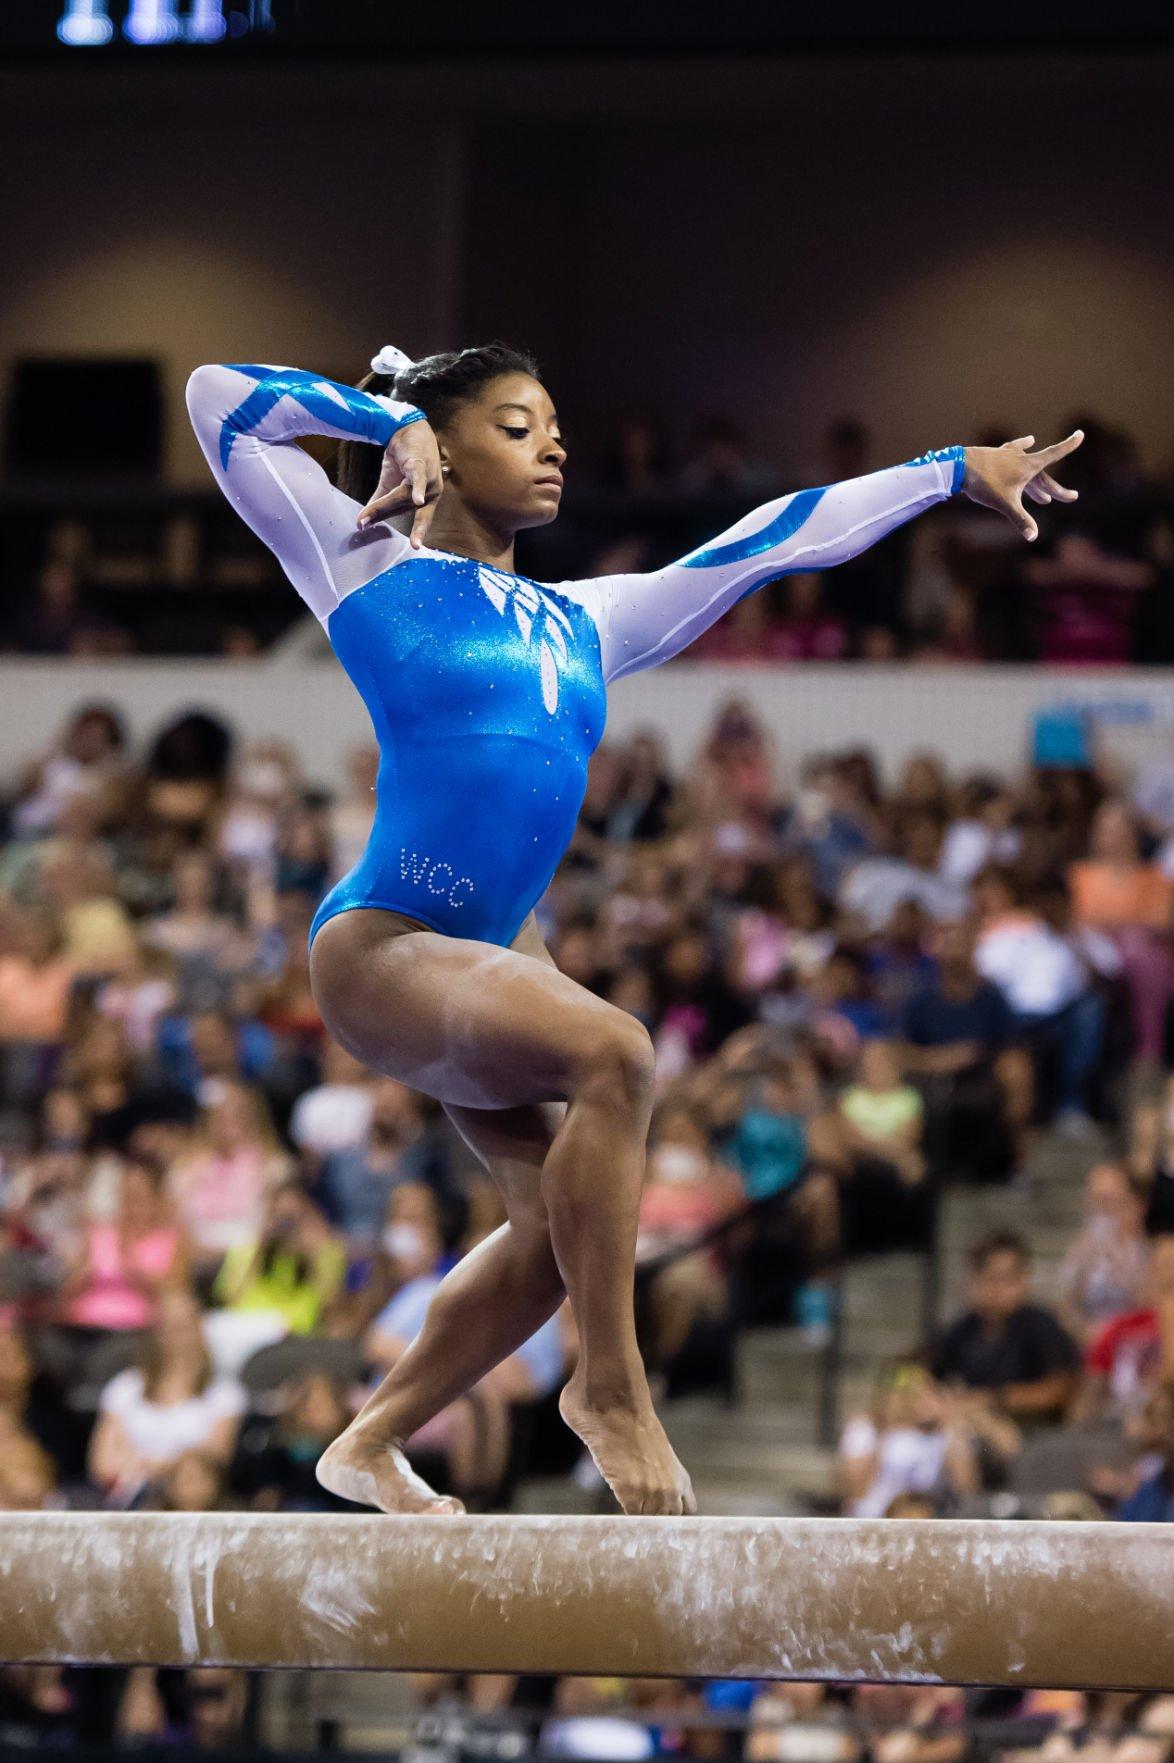 Gabby Douglas Simone Biles Vie For 2015 US Gymnastics